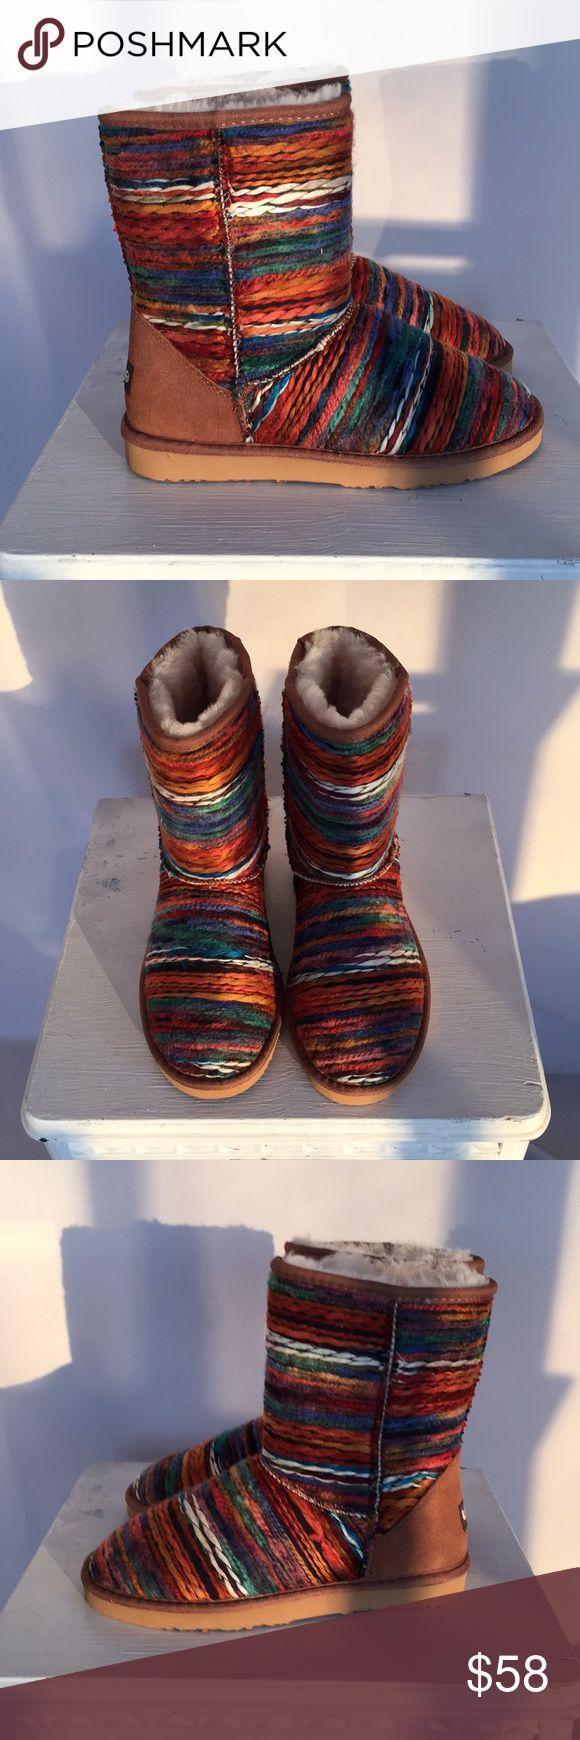 Spotted while shopping on Poshmark: Lamo Juarez Sheepskin Multi-Colored Boots! #poshmark #fashion #shopping #style #Lamo Juarez #Shoes